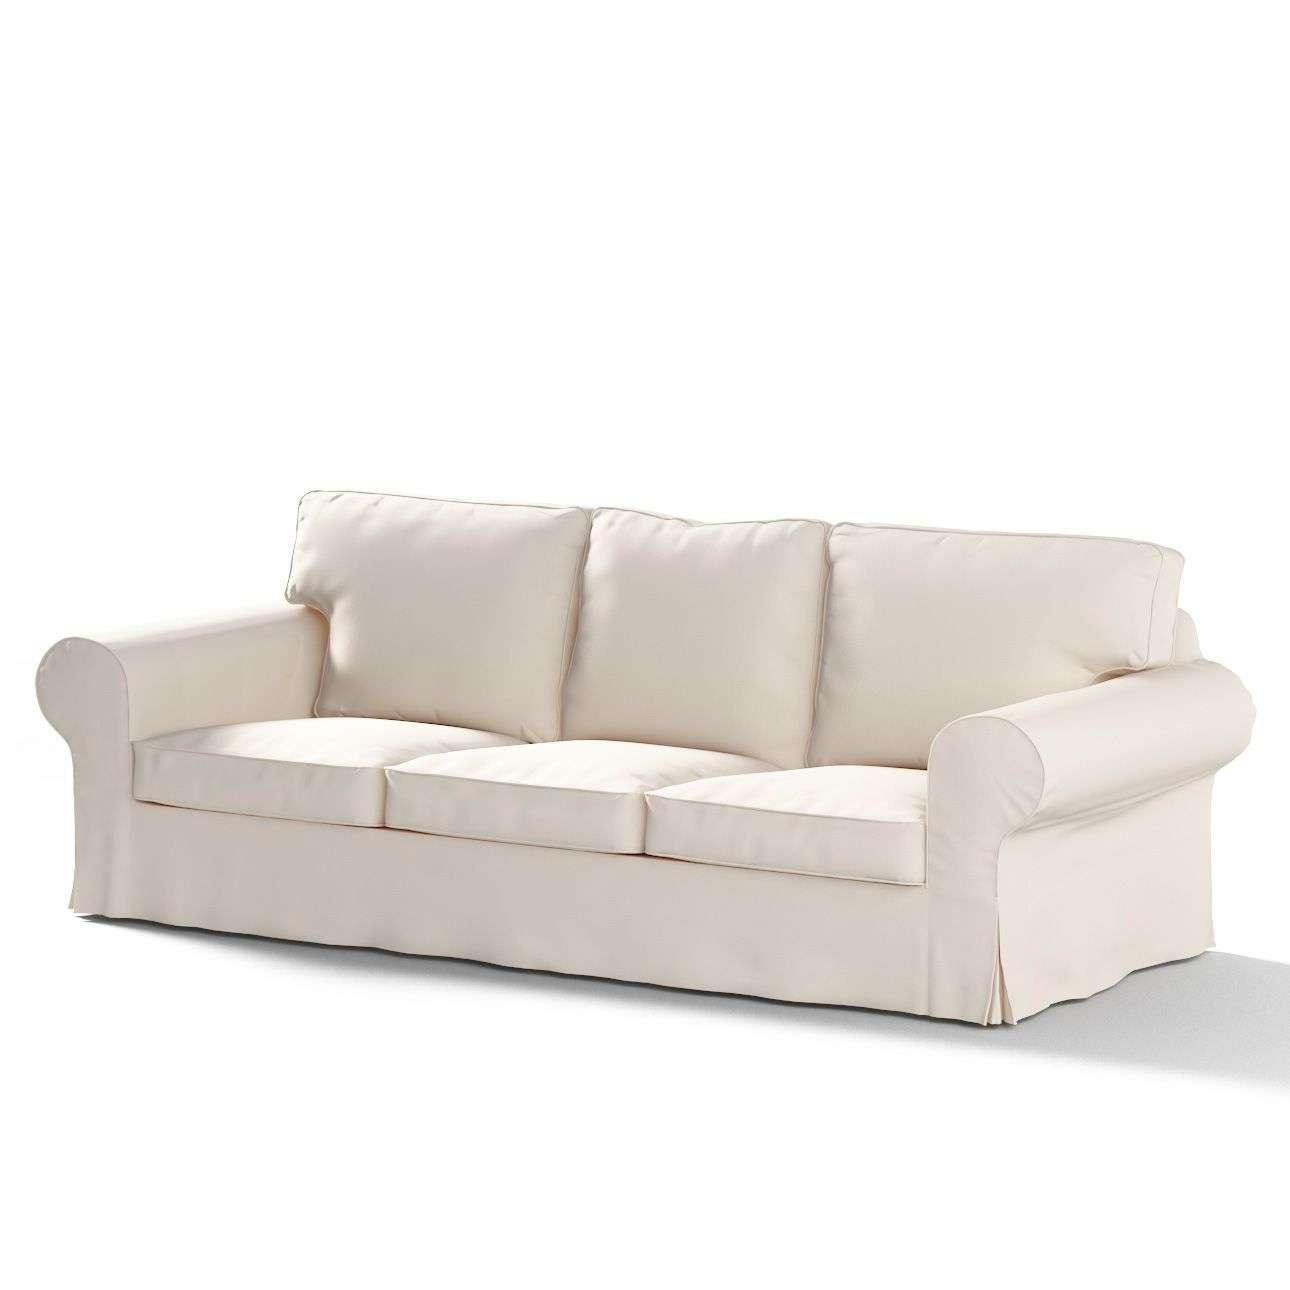 Ikea Kivik Sofa Chaise